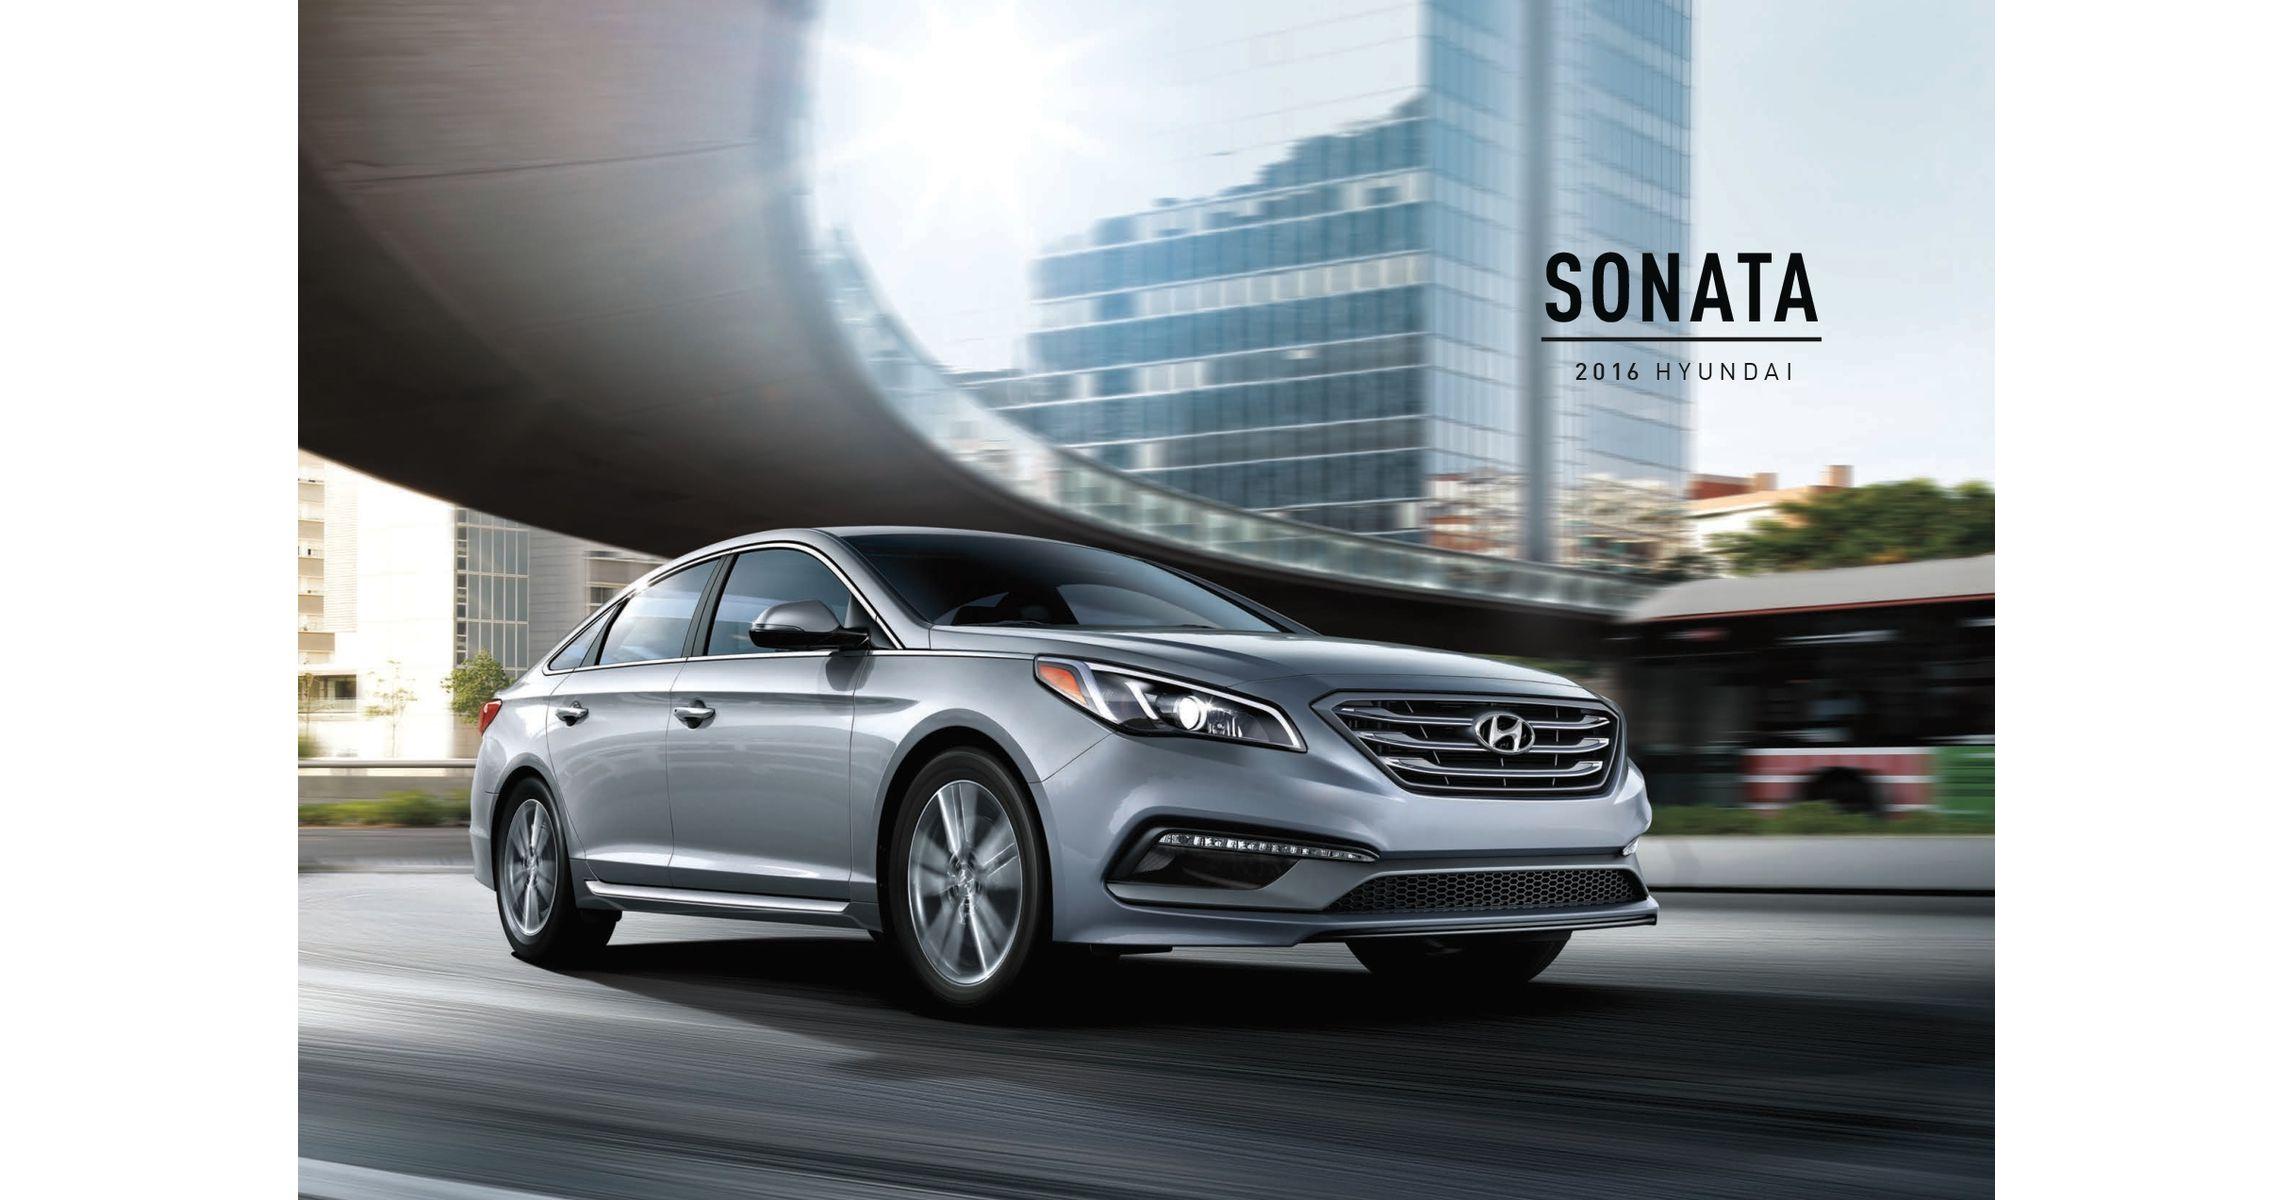 com hyundai automotive interior se photos panel photo sonata instrument sedan